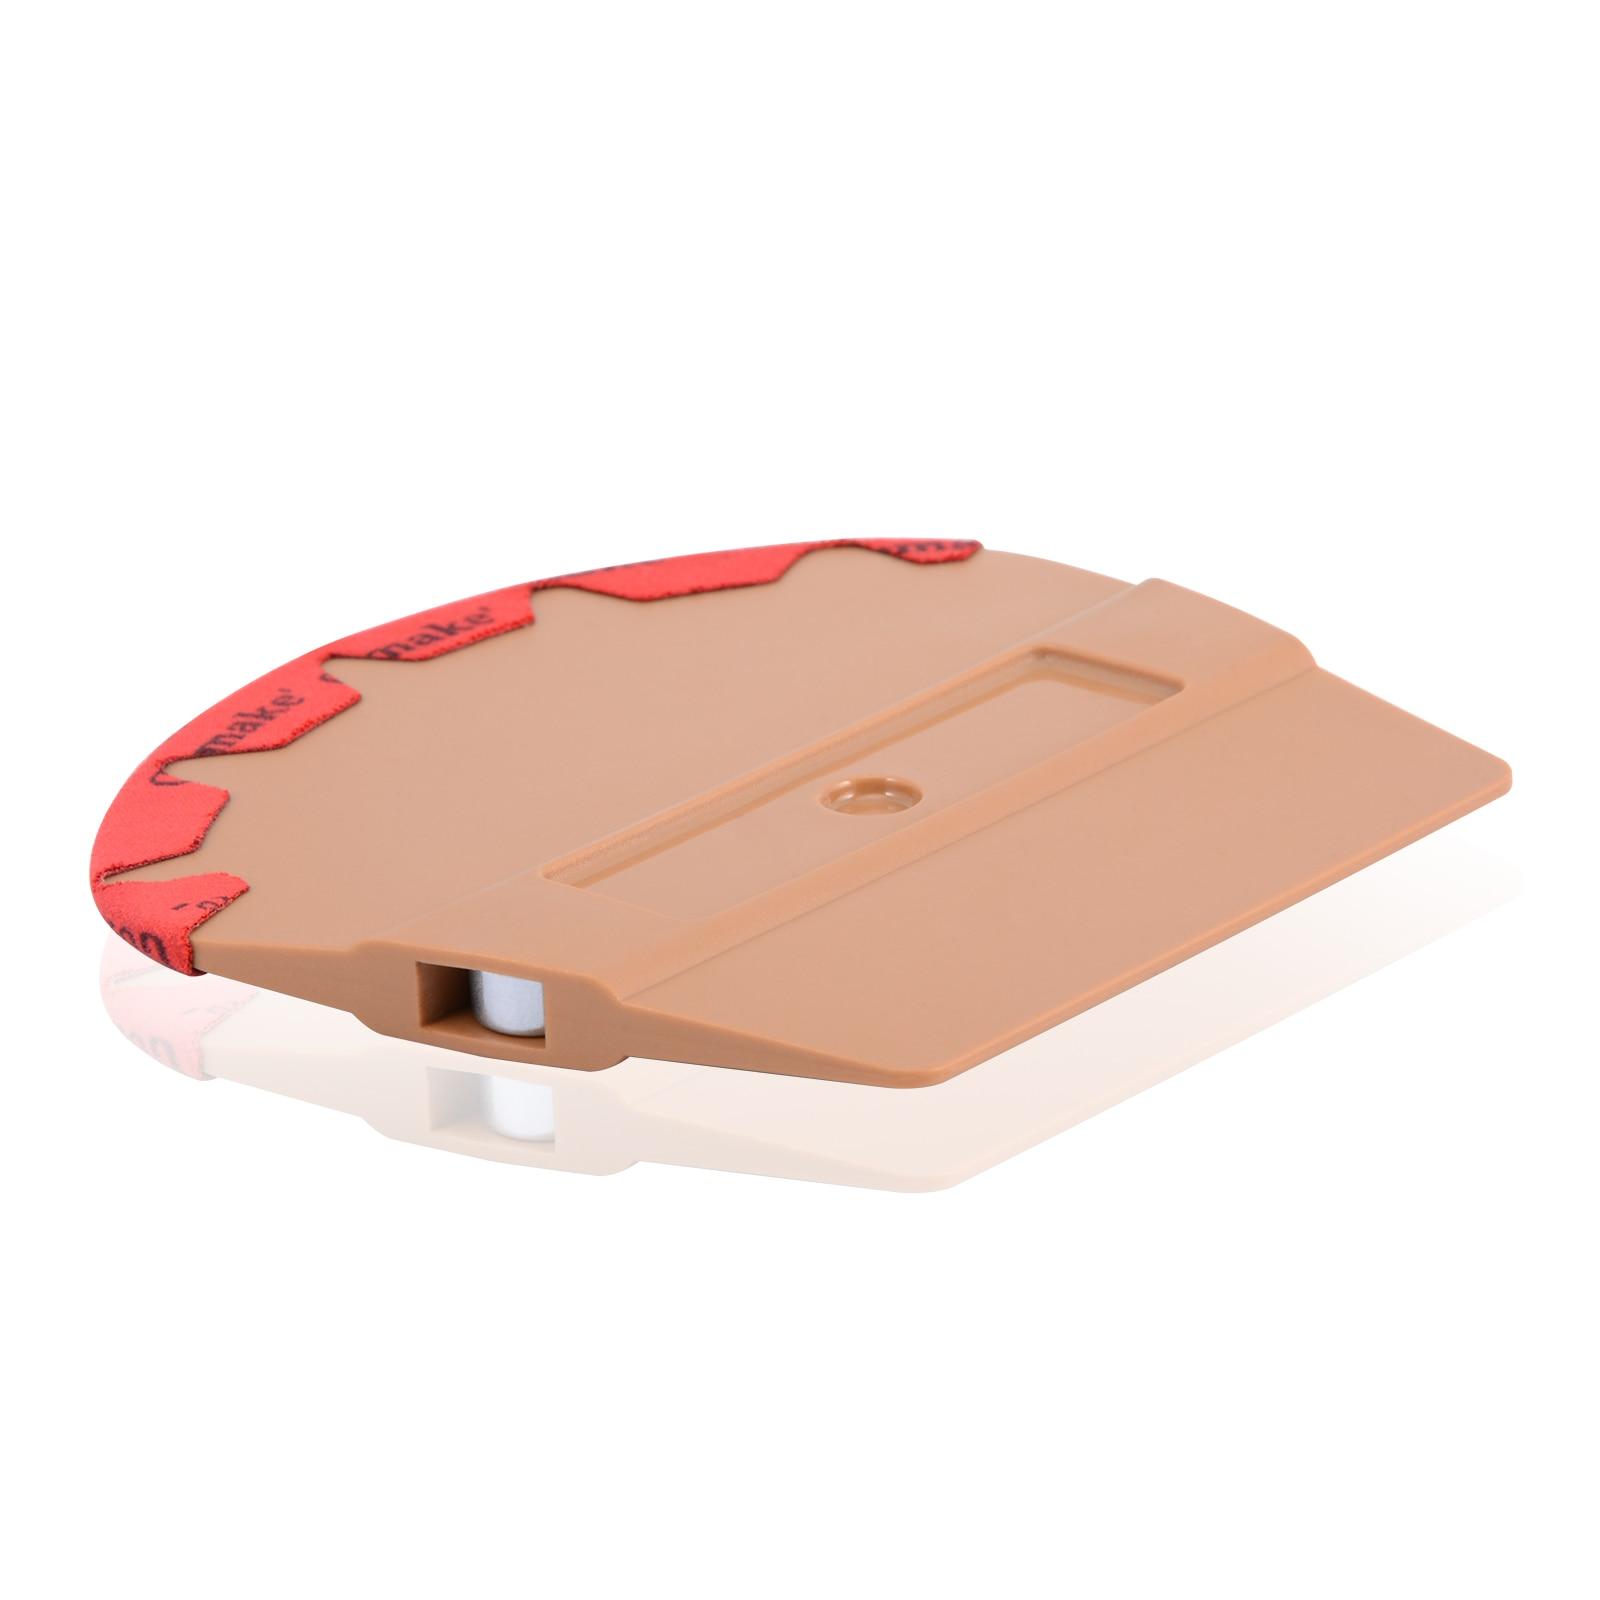 Rascador exprimidor imán de vinilo FOSHIO con paño de microfibra herramientas de envoltura de coche herramientas de envoltura de fibra de carbono herramienta de tinte de ventana accesorios de coche